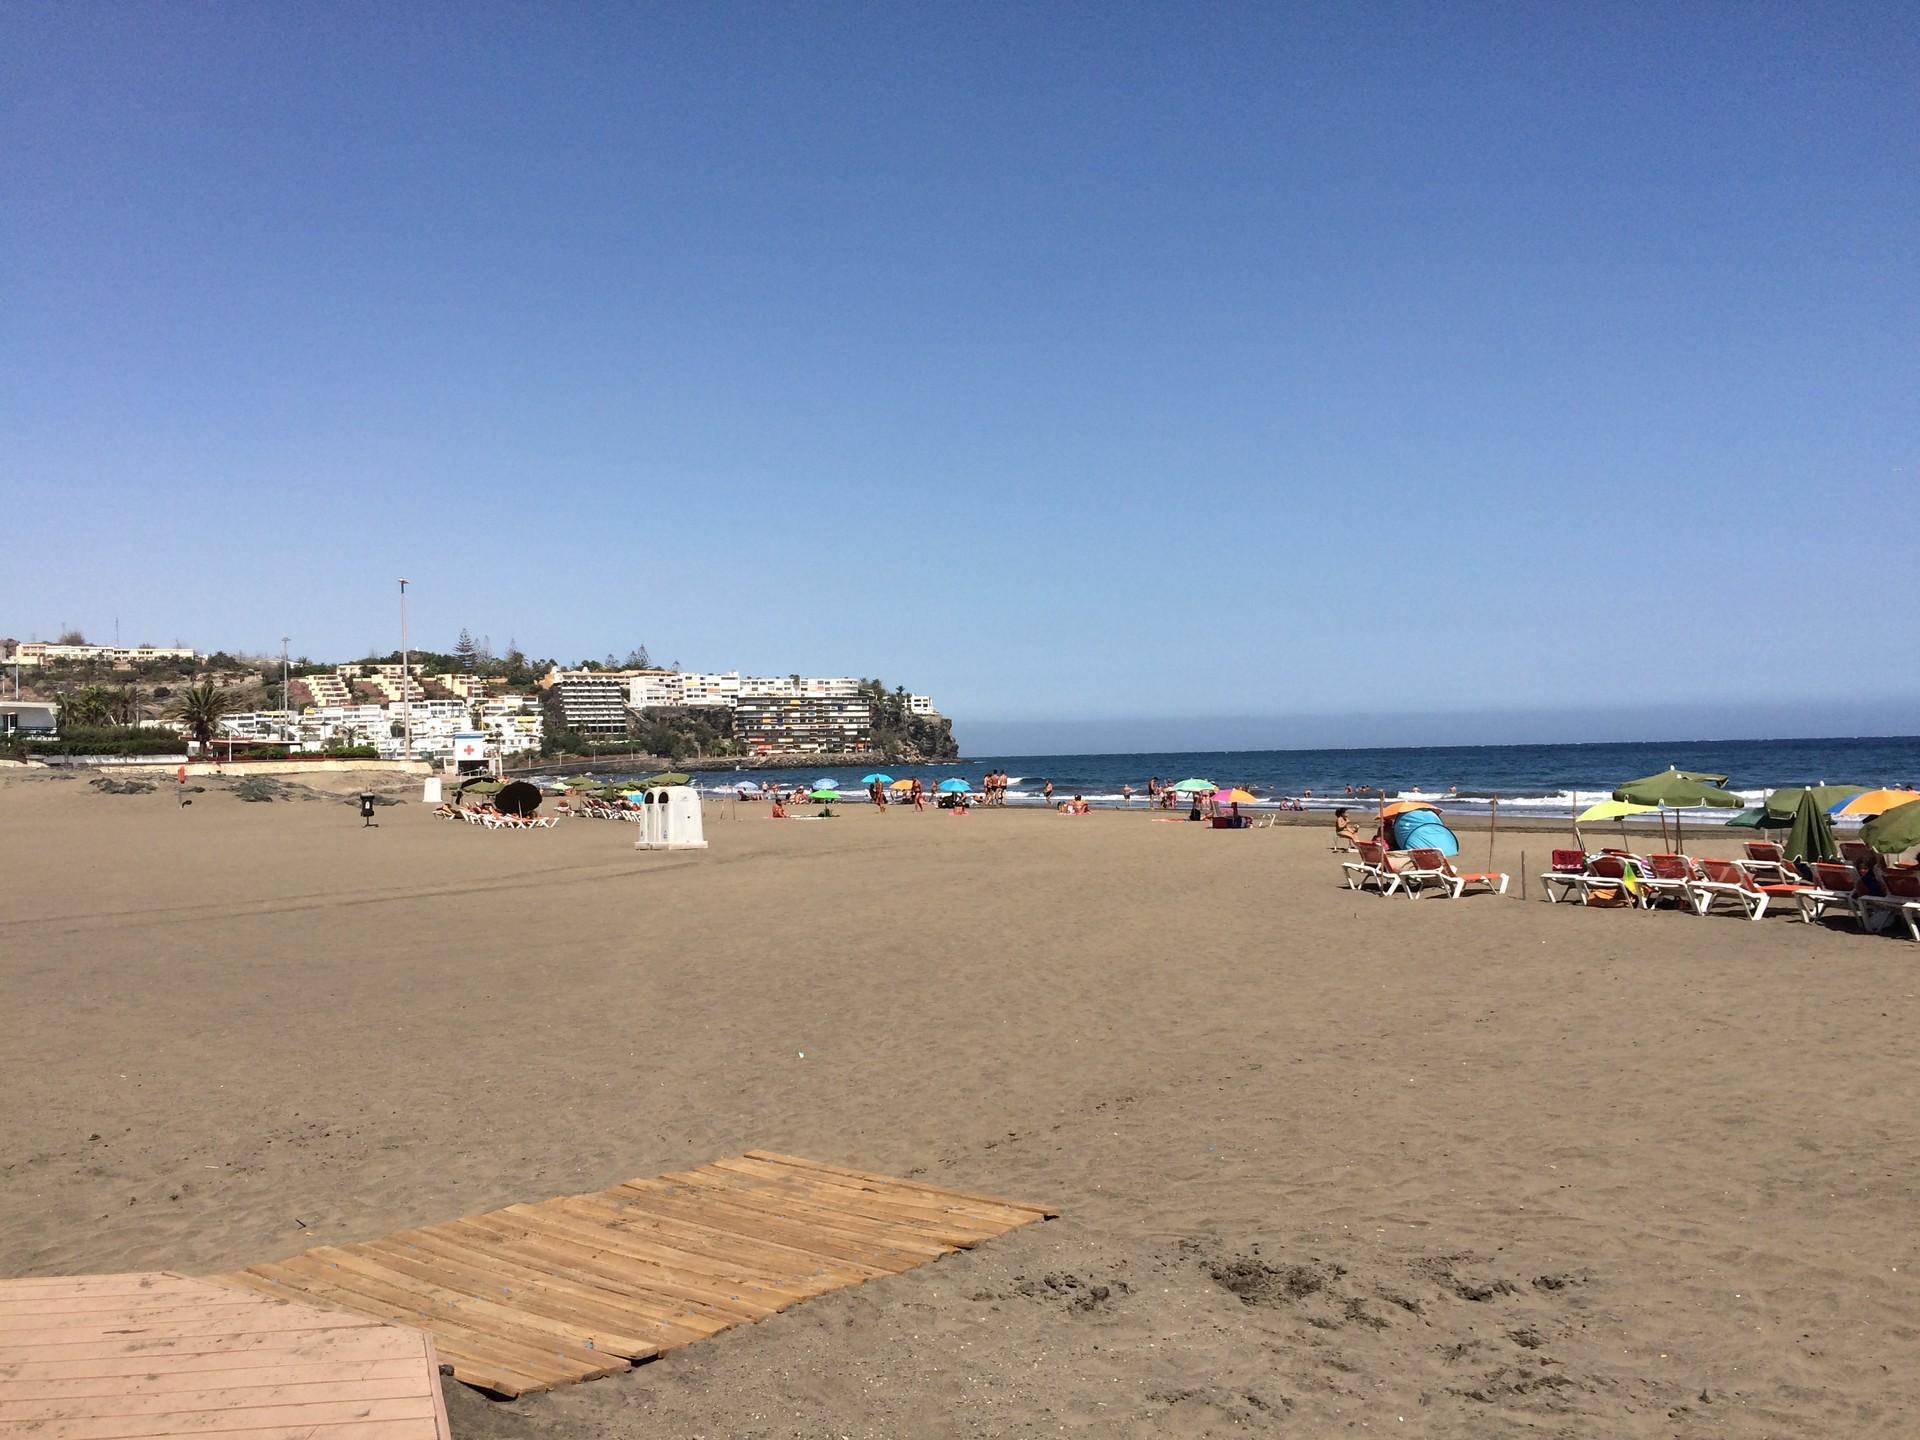 playas-sur-isla-gran-canaria-8bb4f7c499a